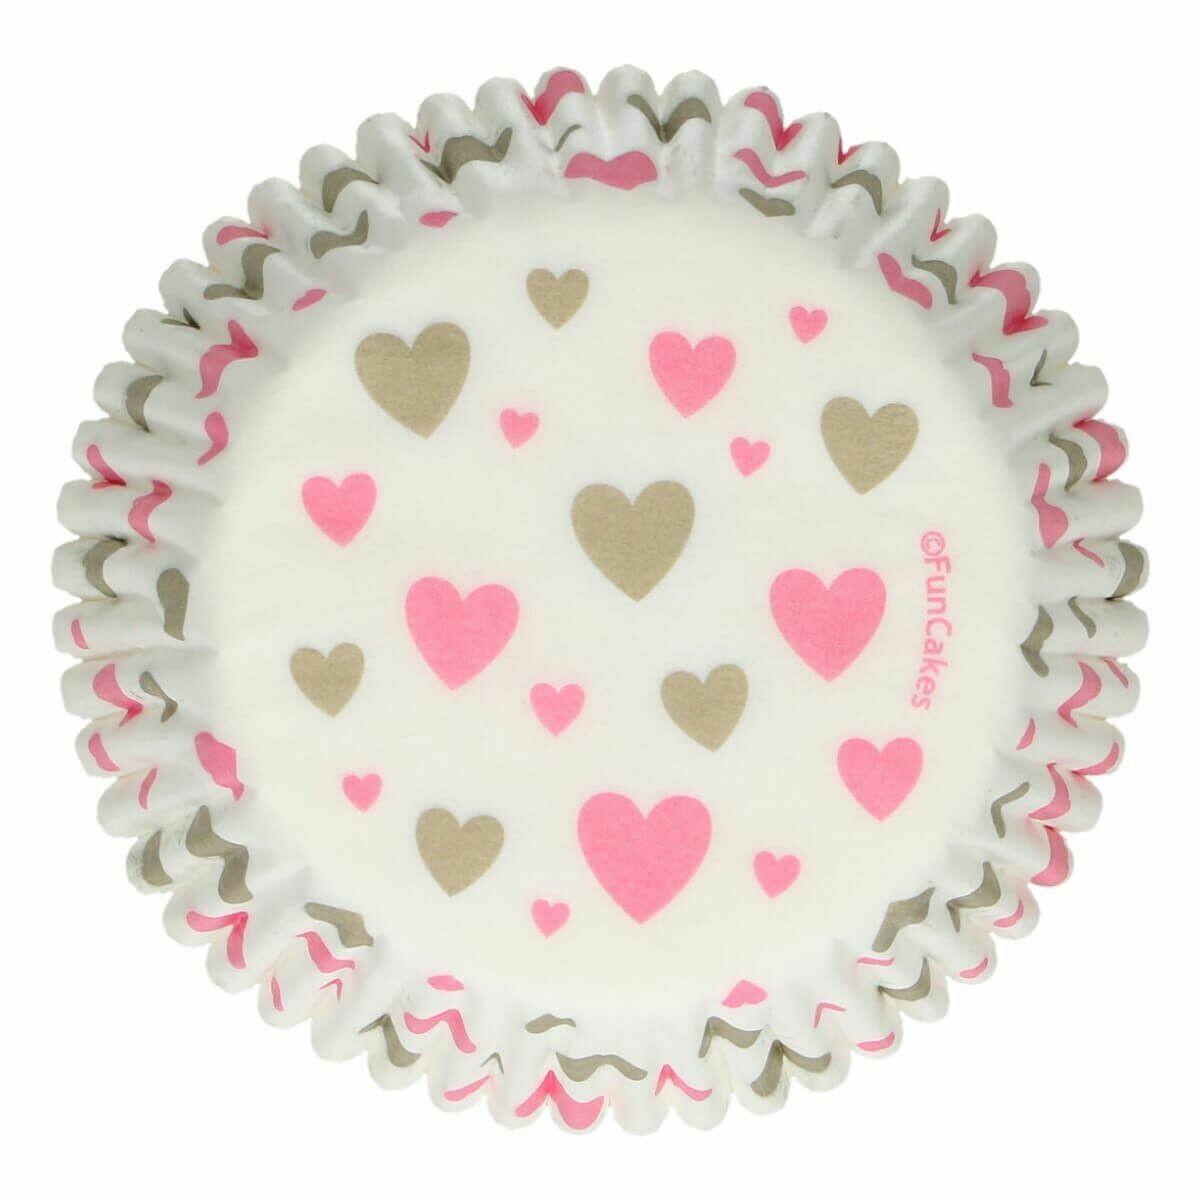 SALE!!! FunCakes Cupcake Cases -HEARTS -Θήκες Ψησίματος Καρδούλες 48 τεμ